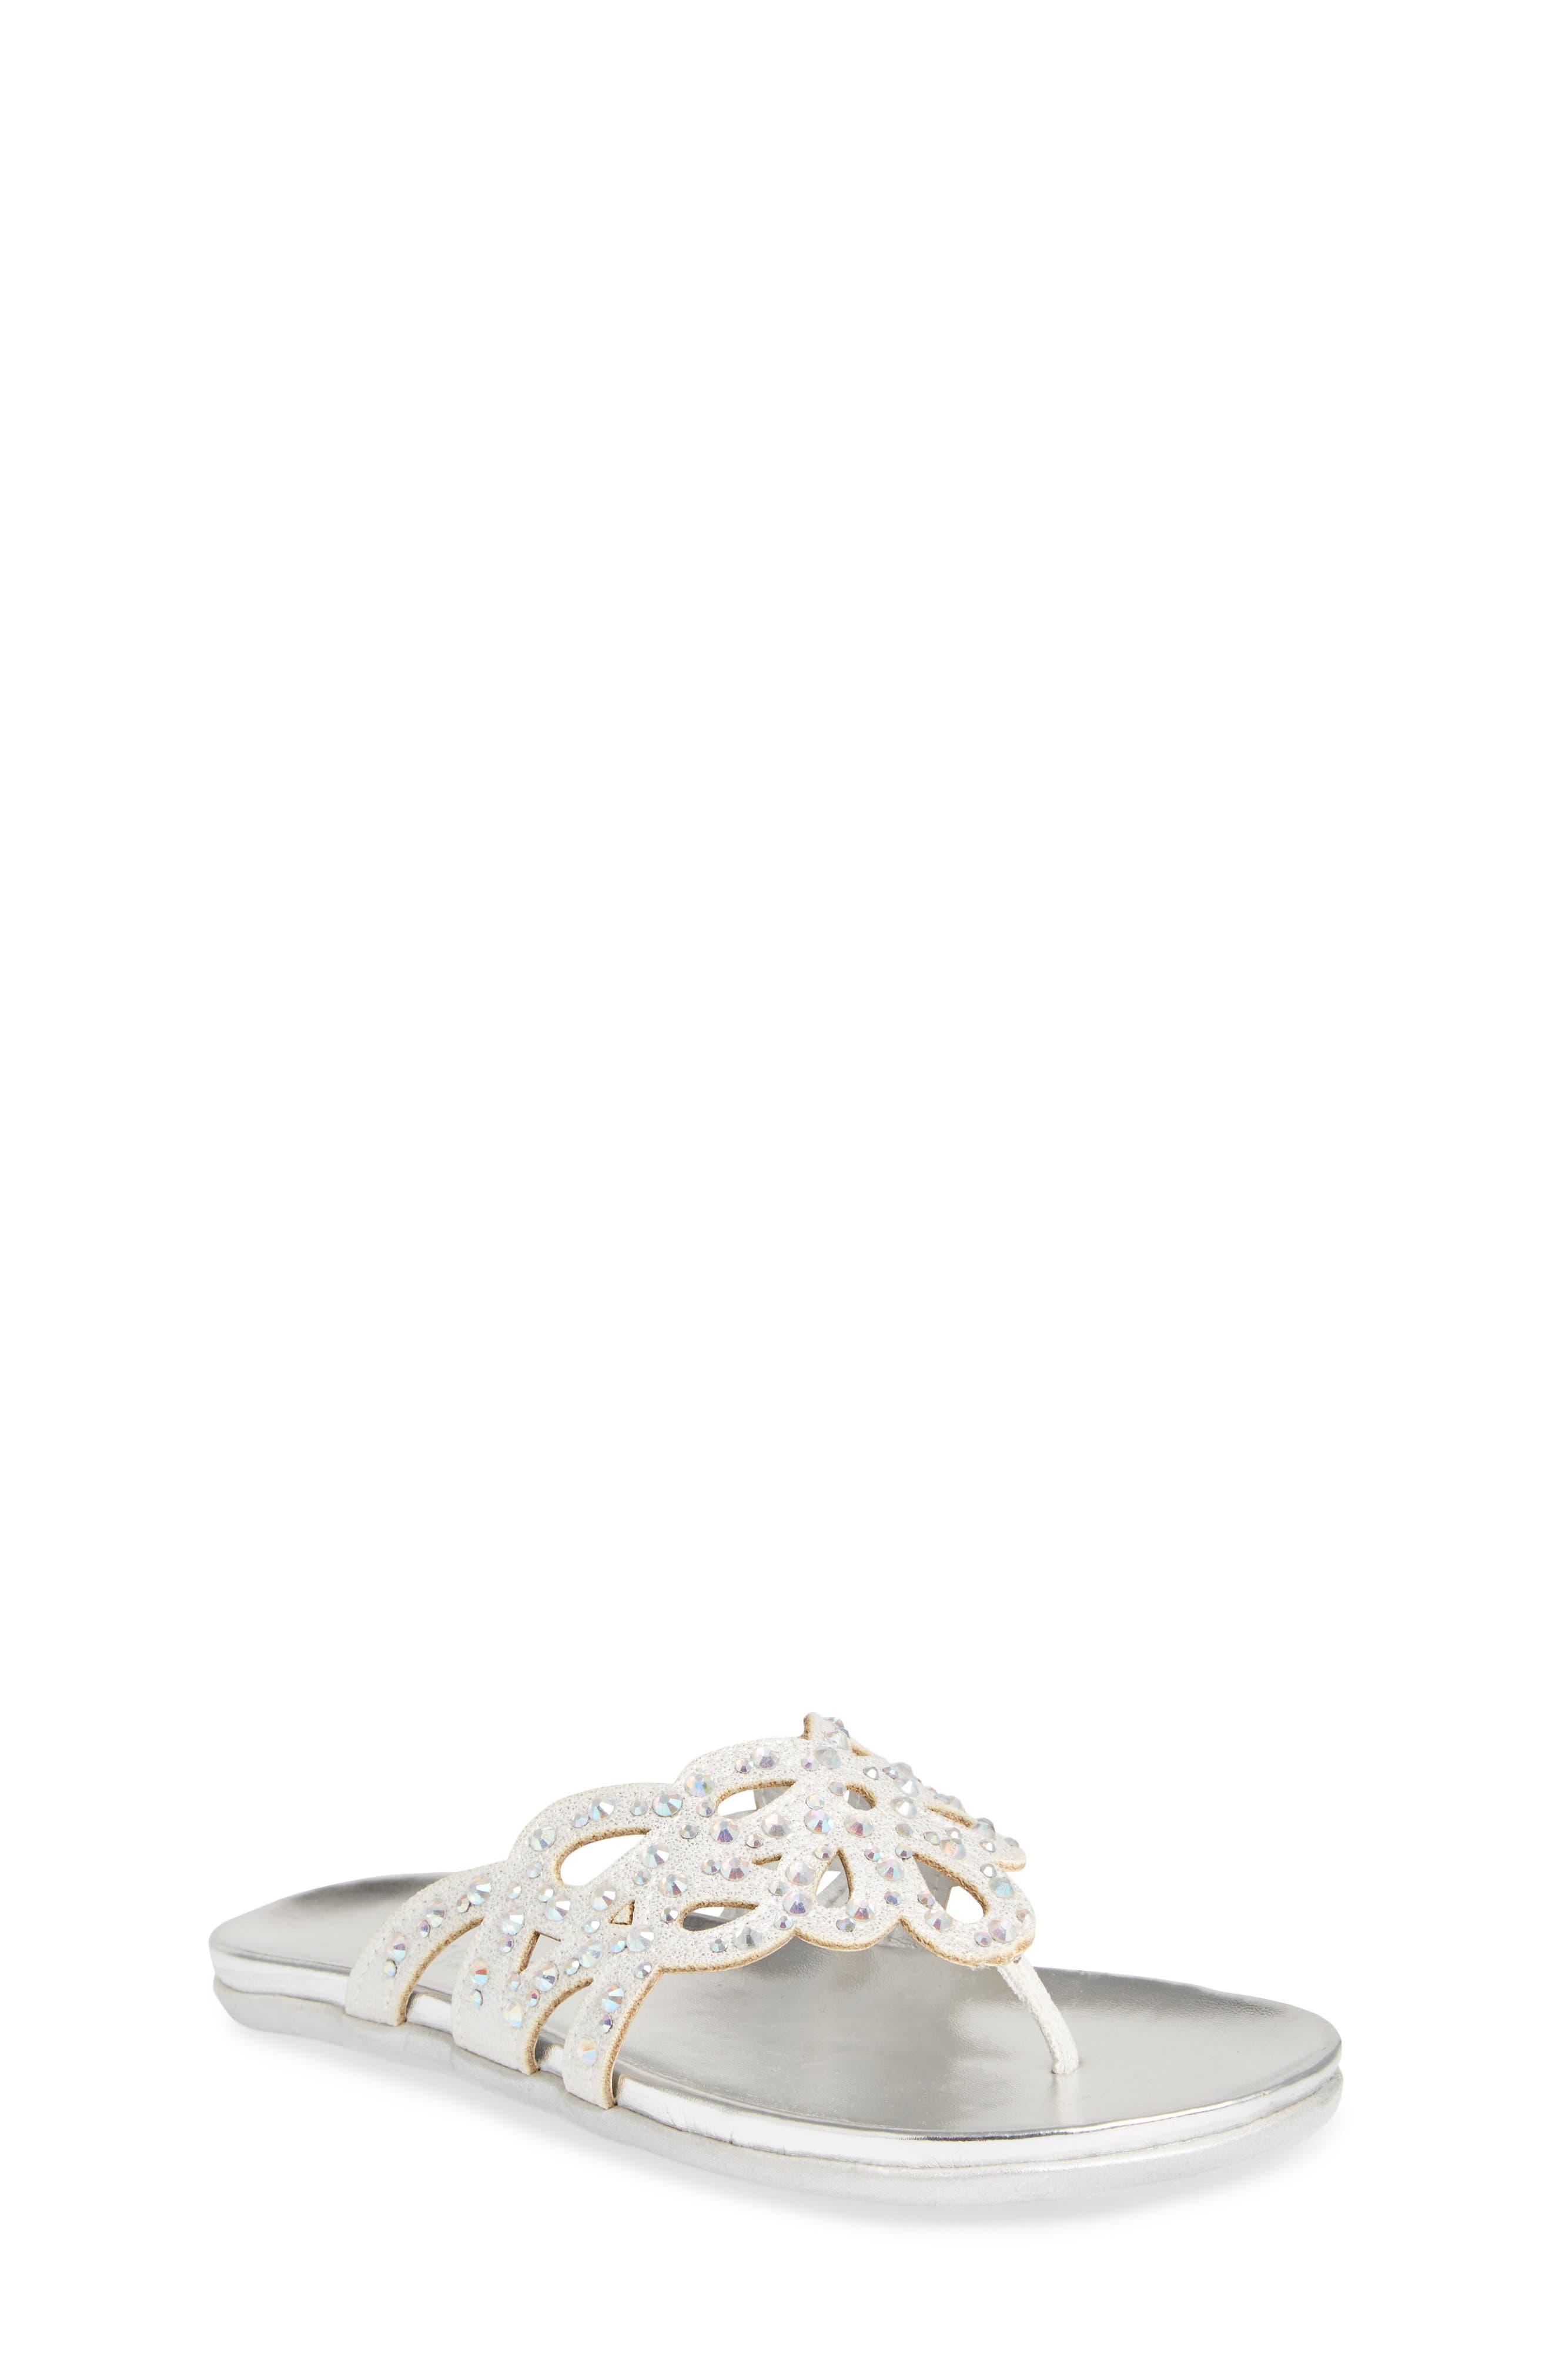 Kenneth Cole New York Flutter Metallic Crystal Thong Sandal,                             Main thumbnail 1, color,                             044